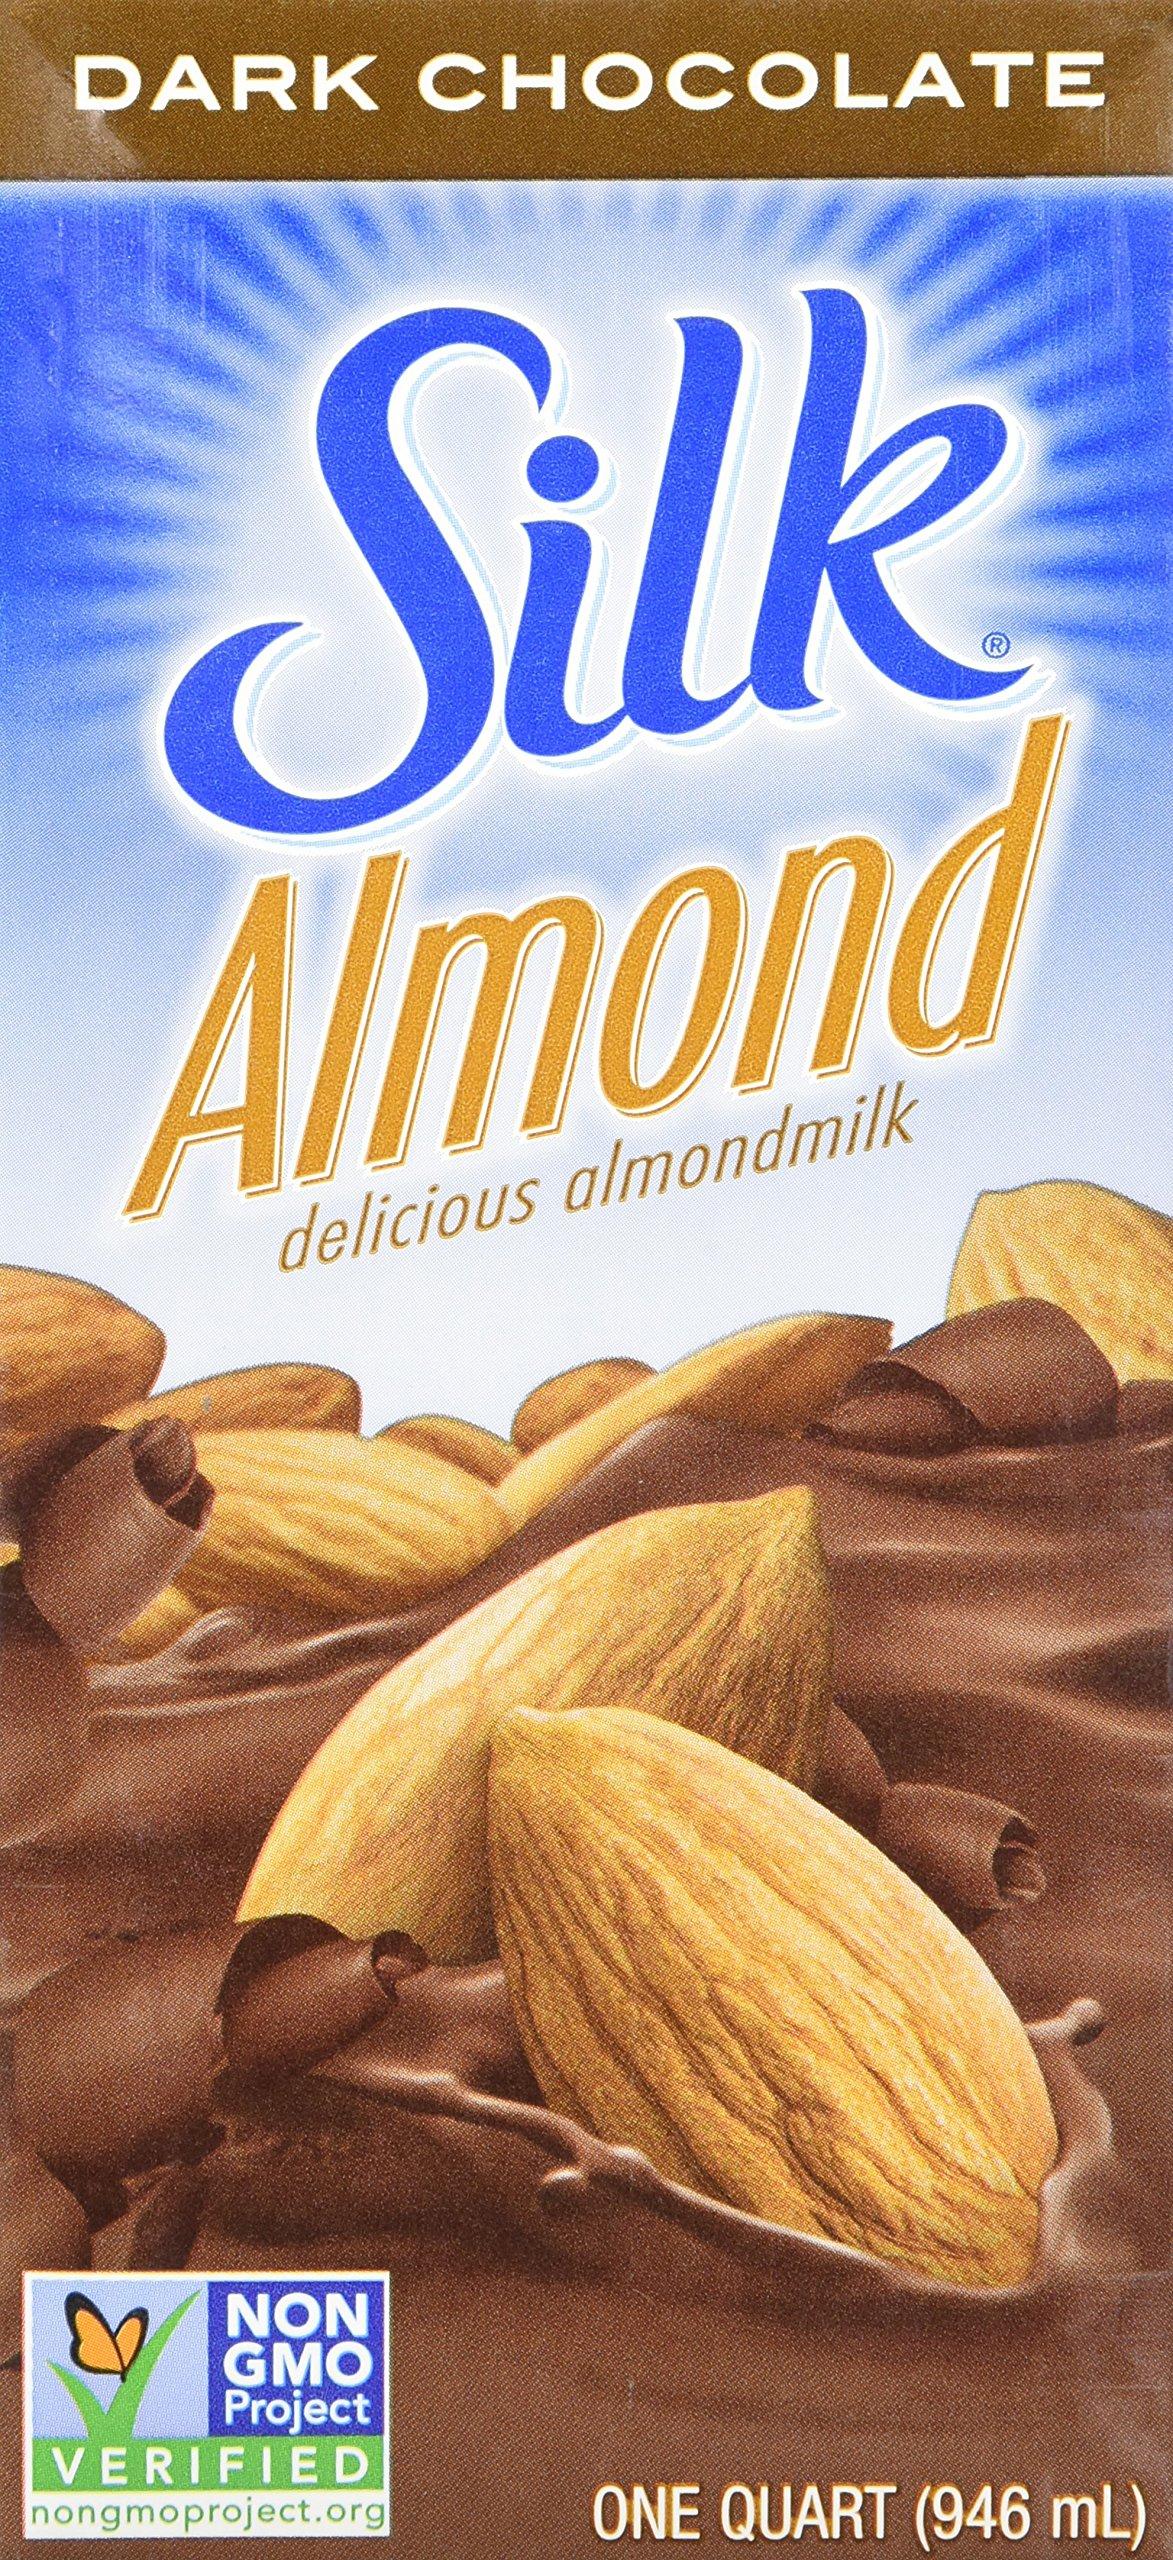 Silk Almond Milk Dark Chocolate 32 oz (Pack of 6) Shelf Stable, Dark Chocolate Flavored Non-Dairy Almond Milk, Individually Packaged by Silk (Image #1)